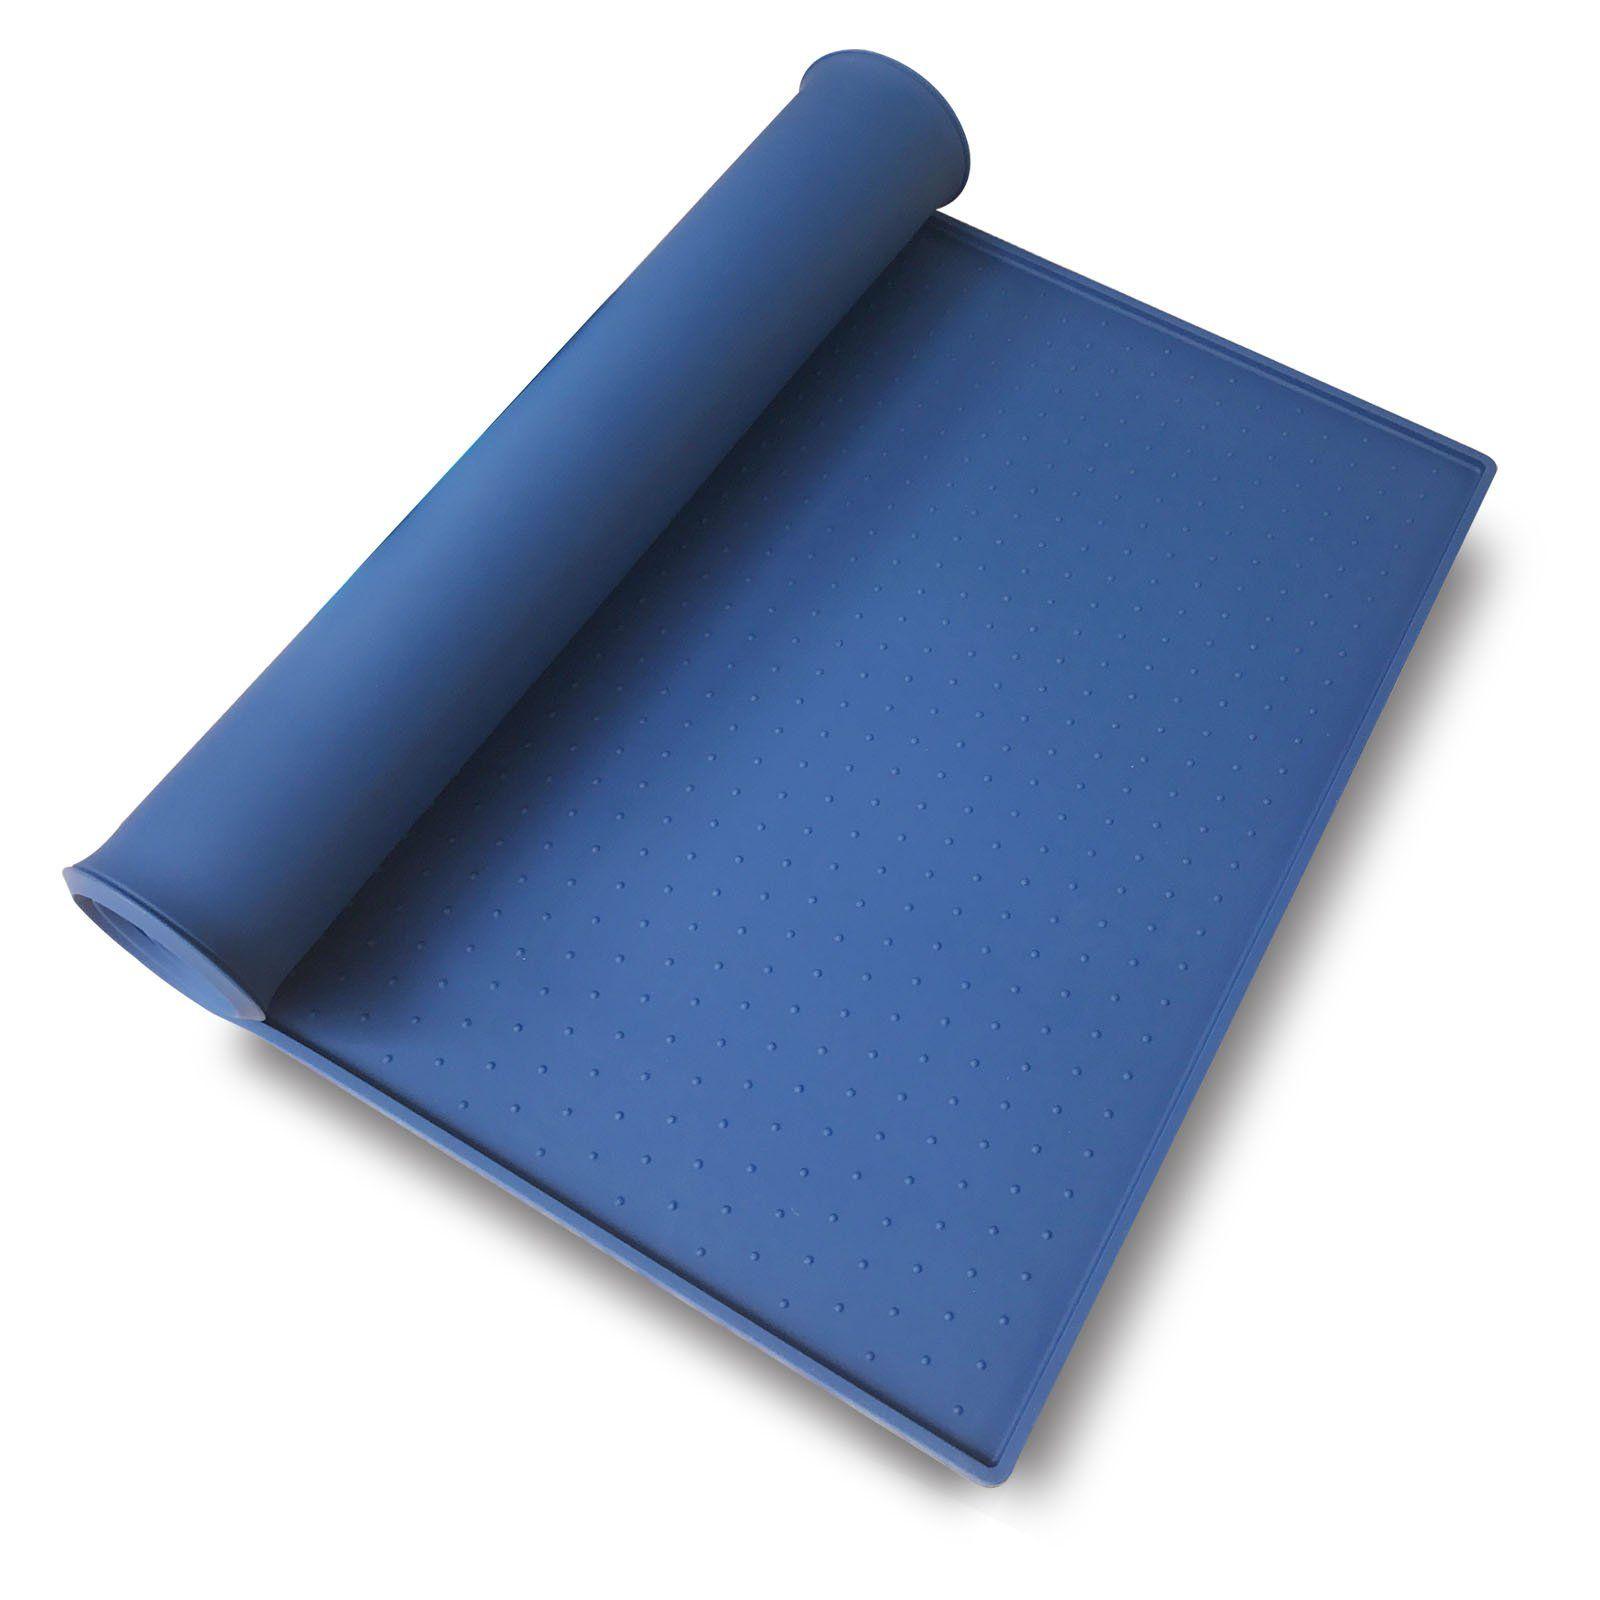 Alled dog cat feeding mat fda grade silicone waterproof